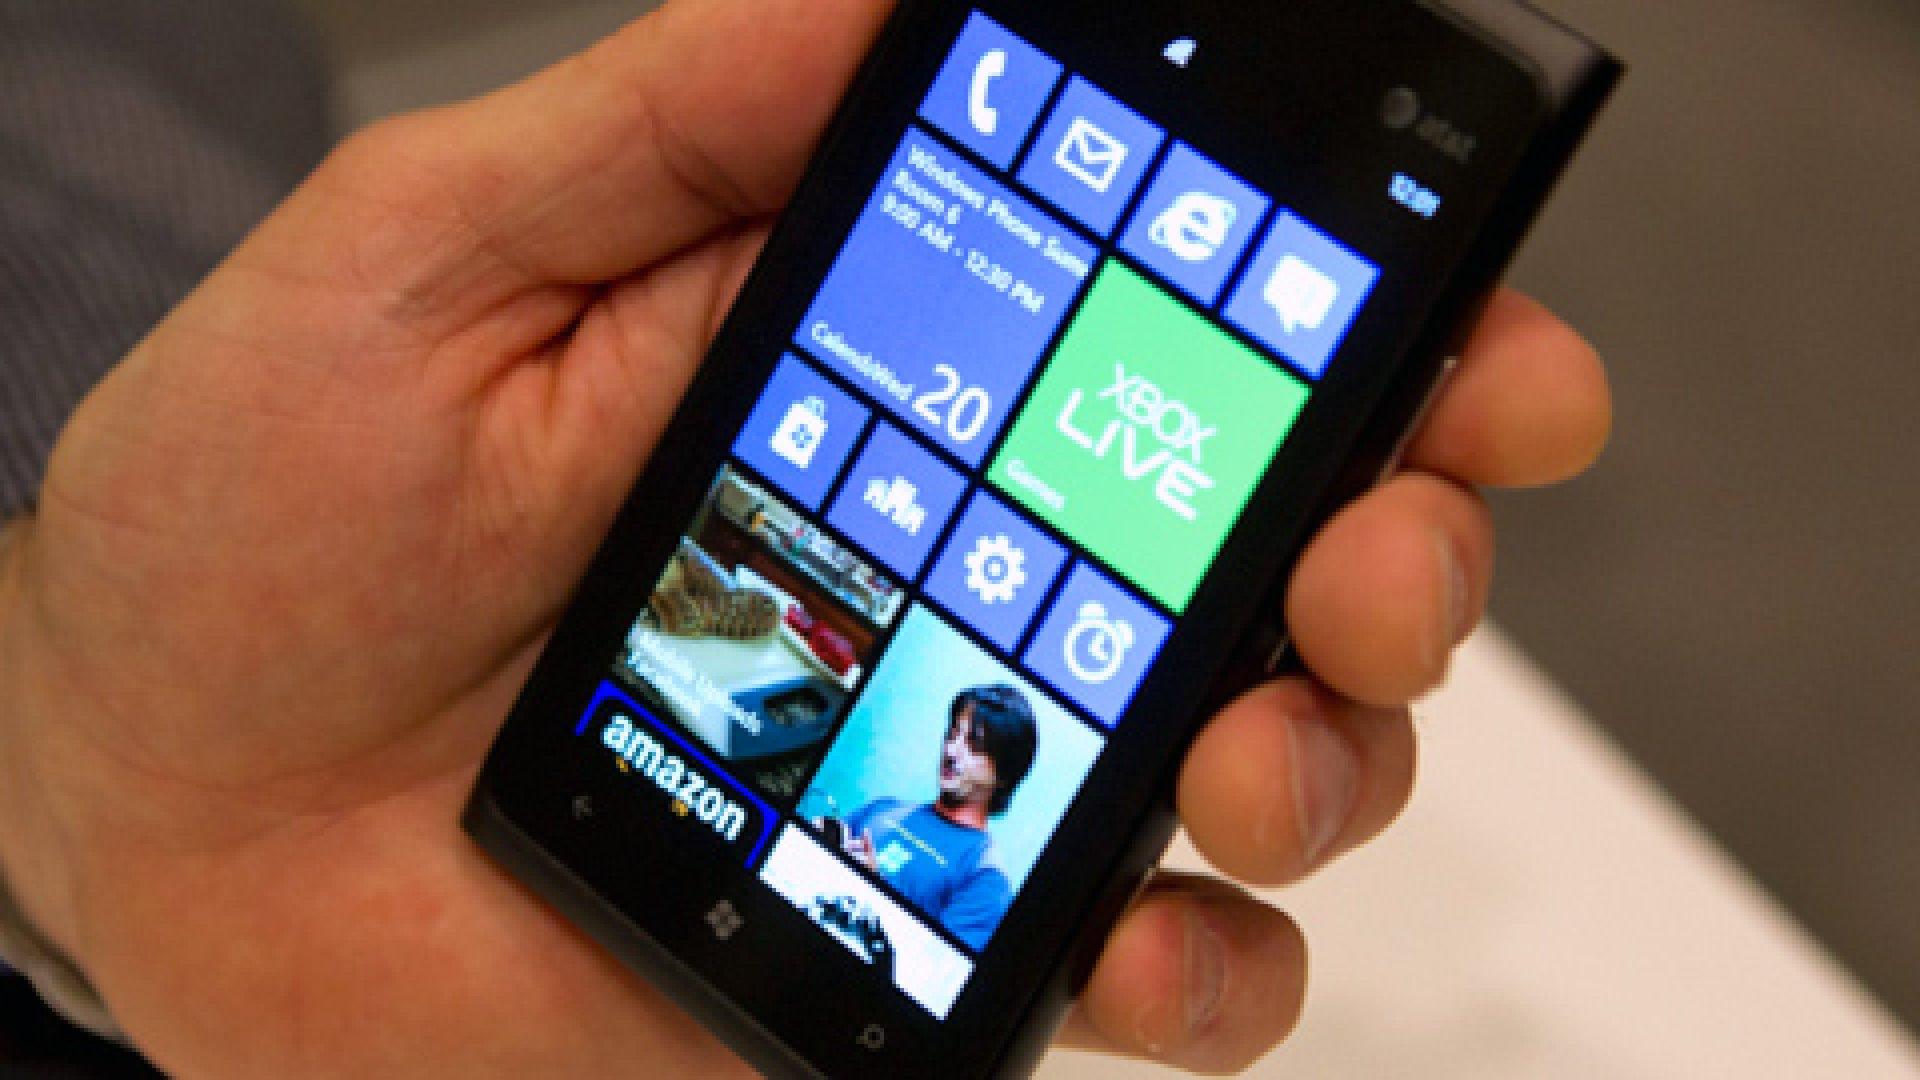 Microsoft Windows Phone 8: Should You Make the Switch?